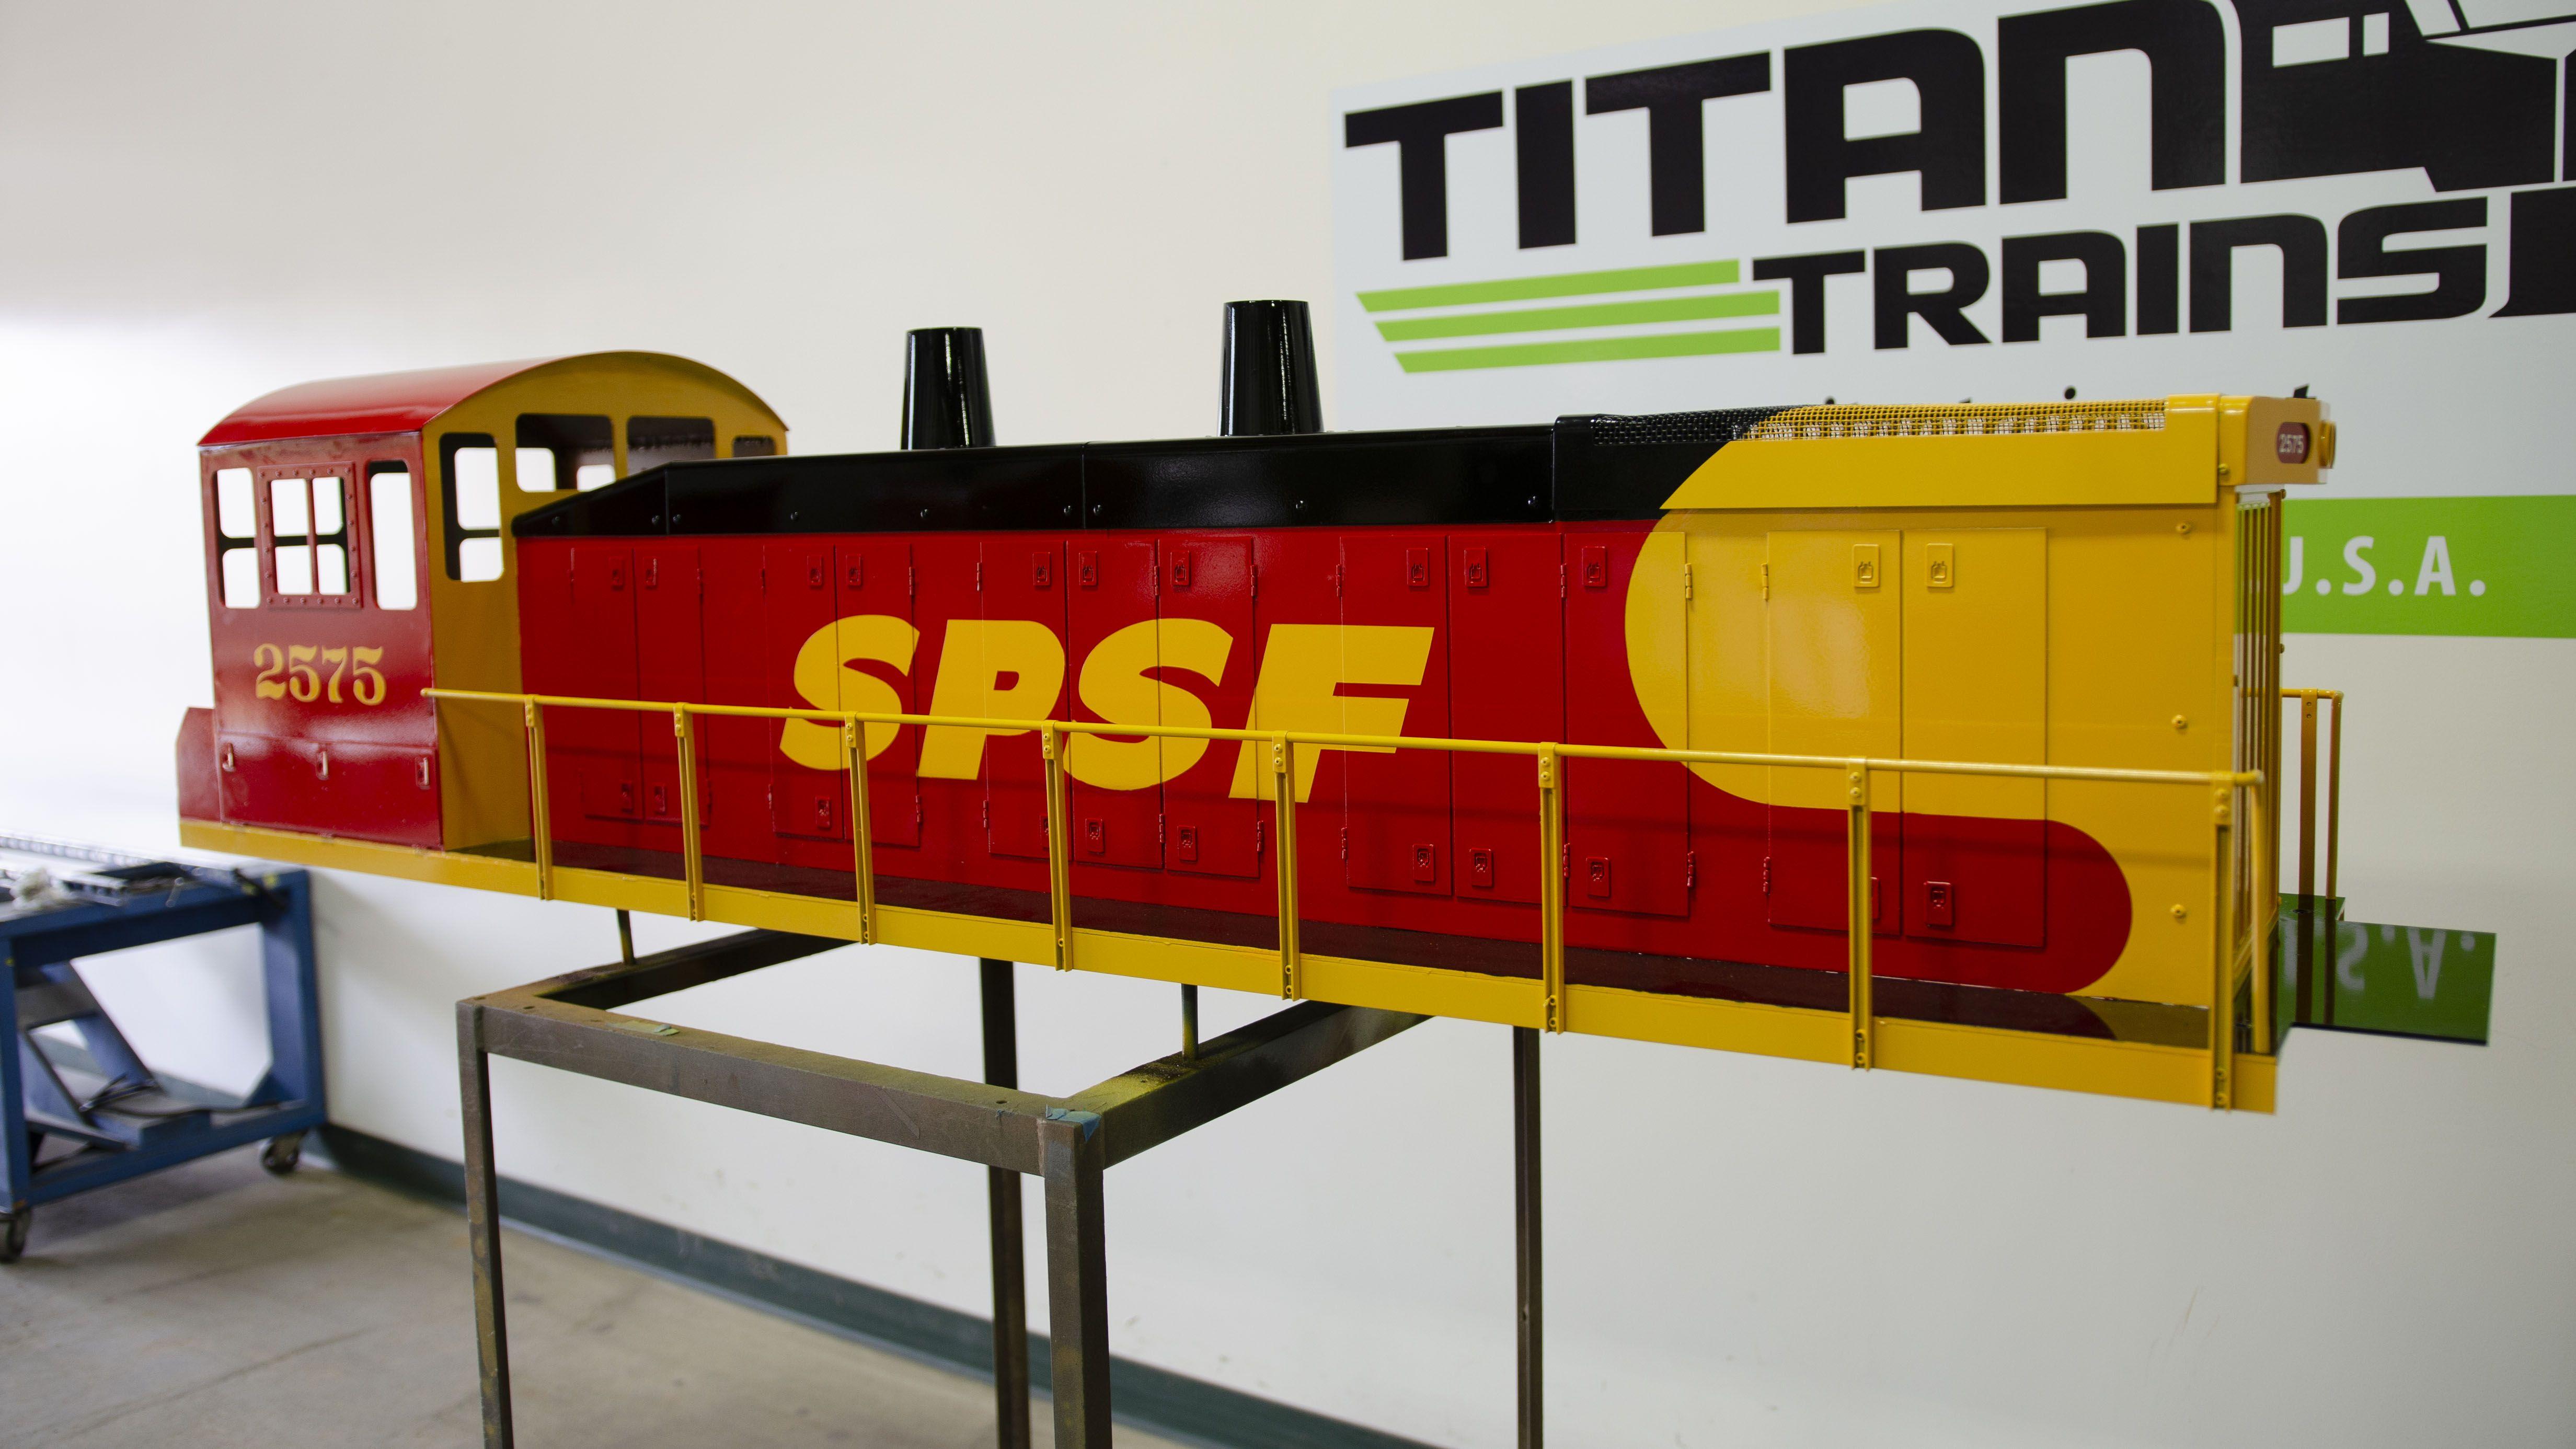 Titantrains Sw1500 Locomotive Train Train Car Custom Paint Jobs